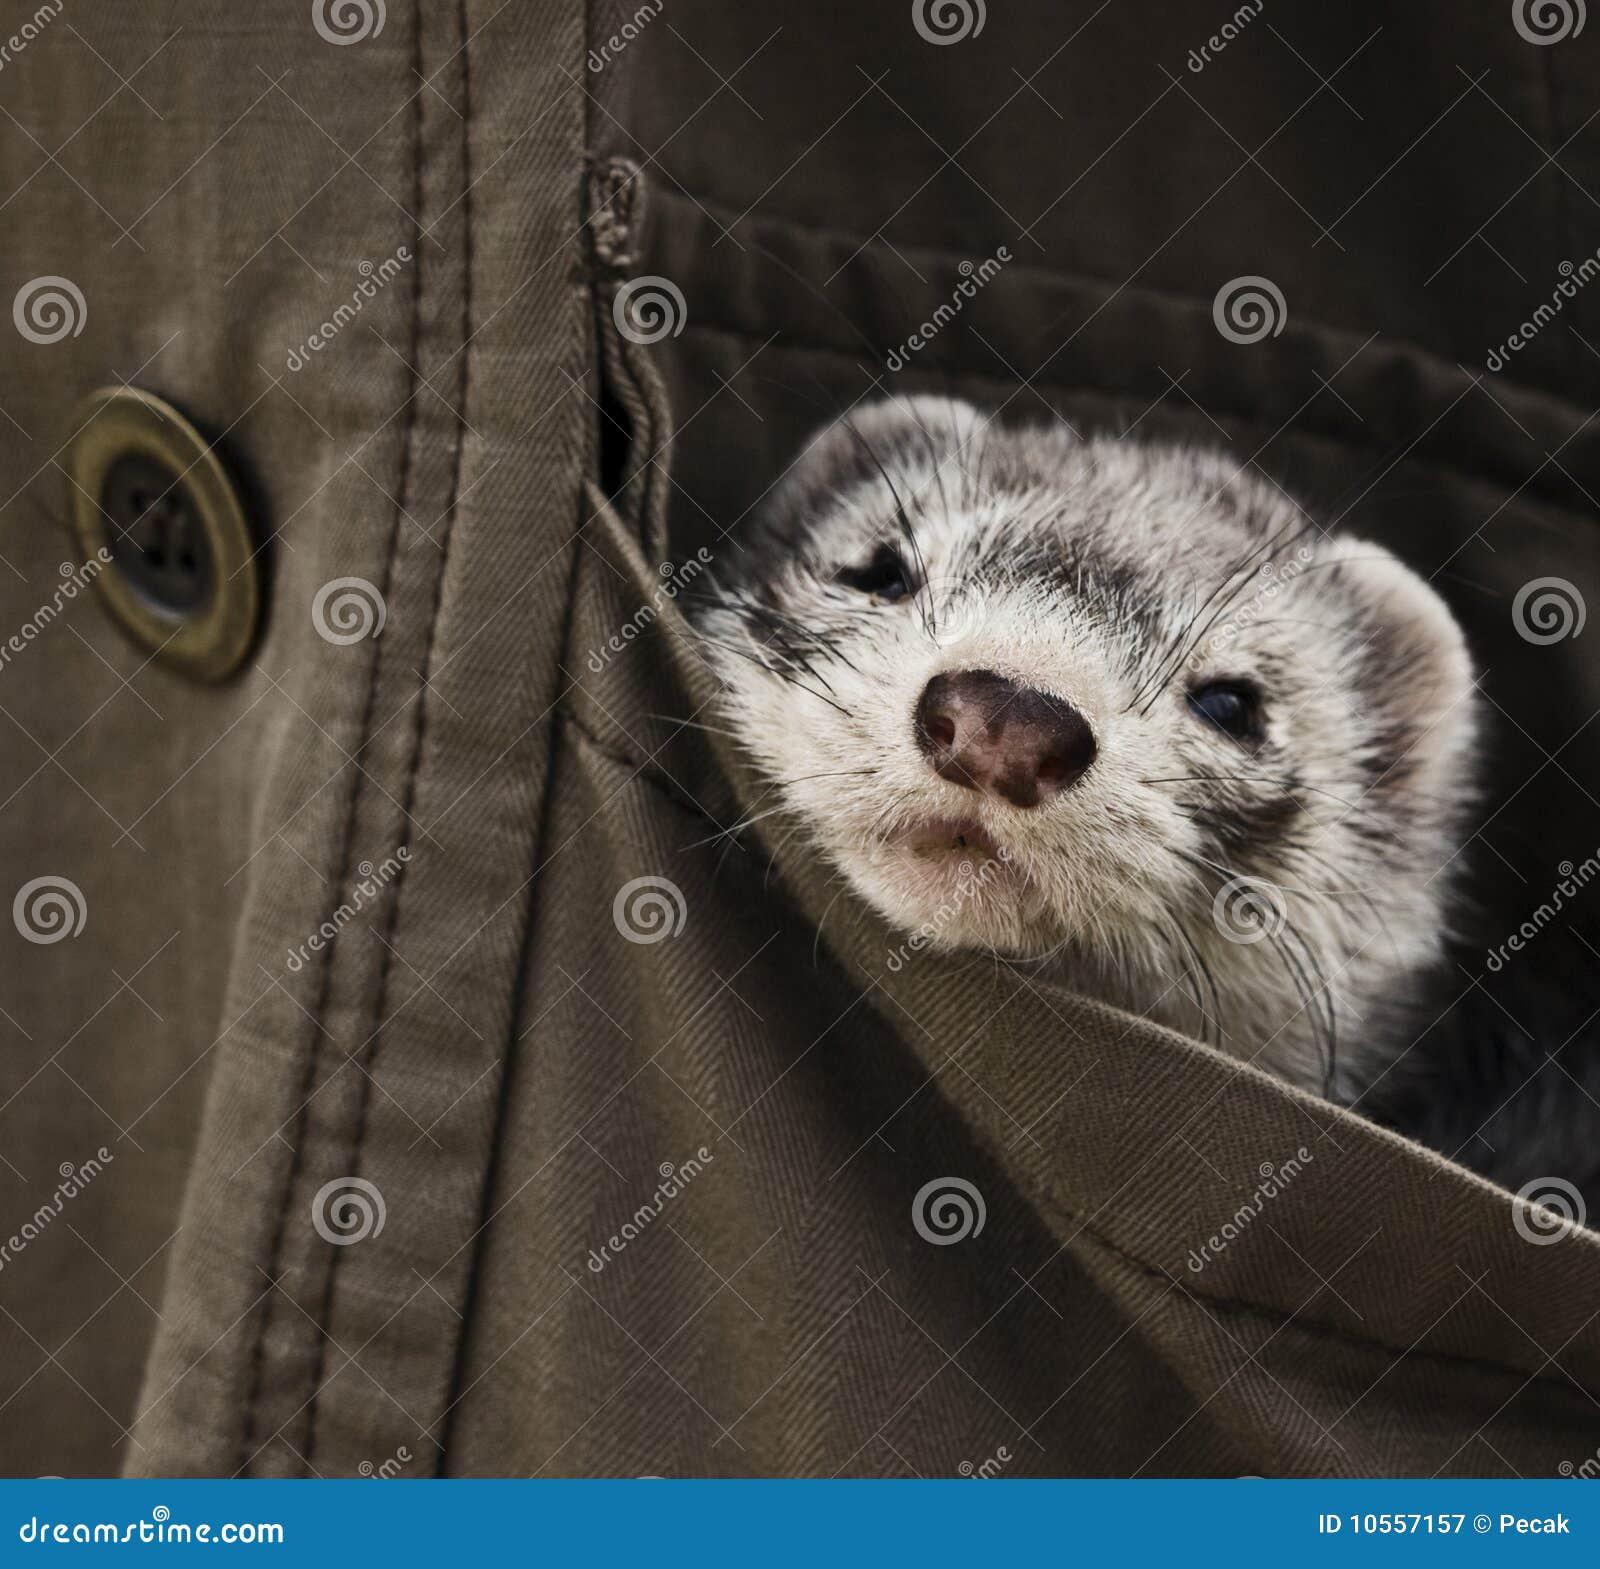 любимчик ferret